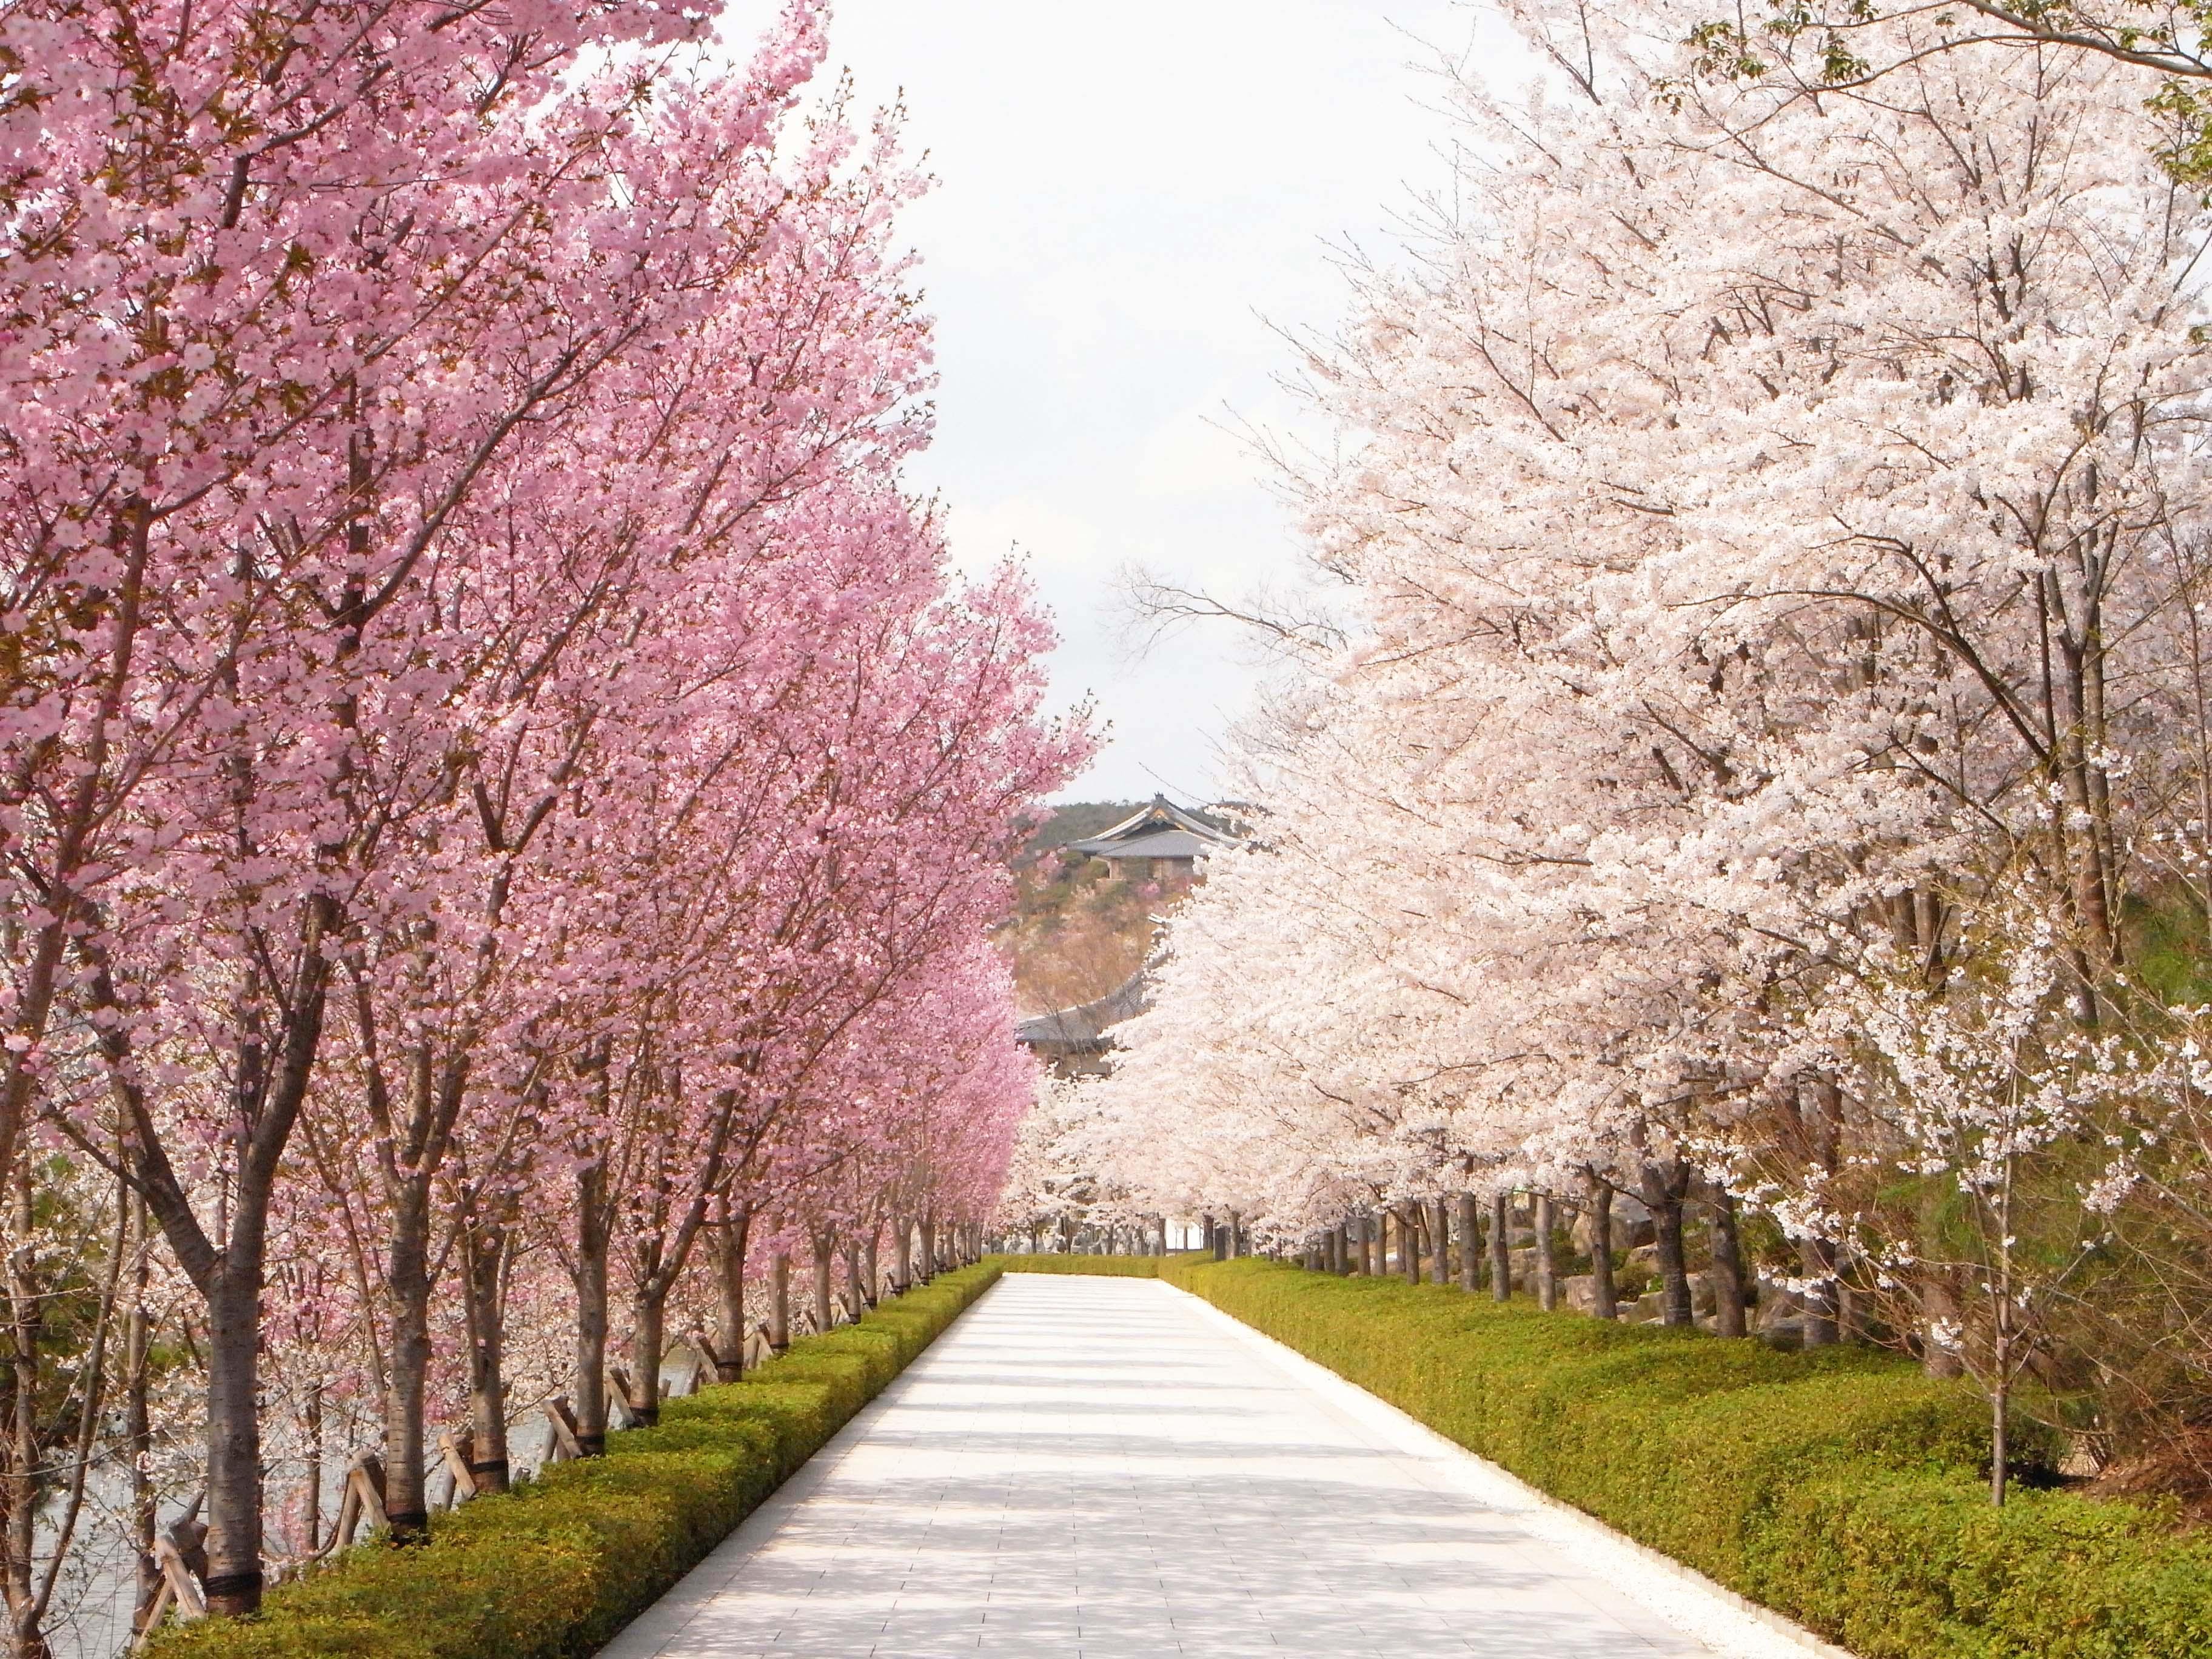 NAVER まとめ【桜】もう、みんな花見した?していない人のための桜集【舞い散る】